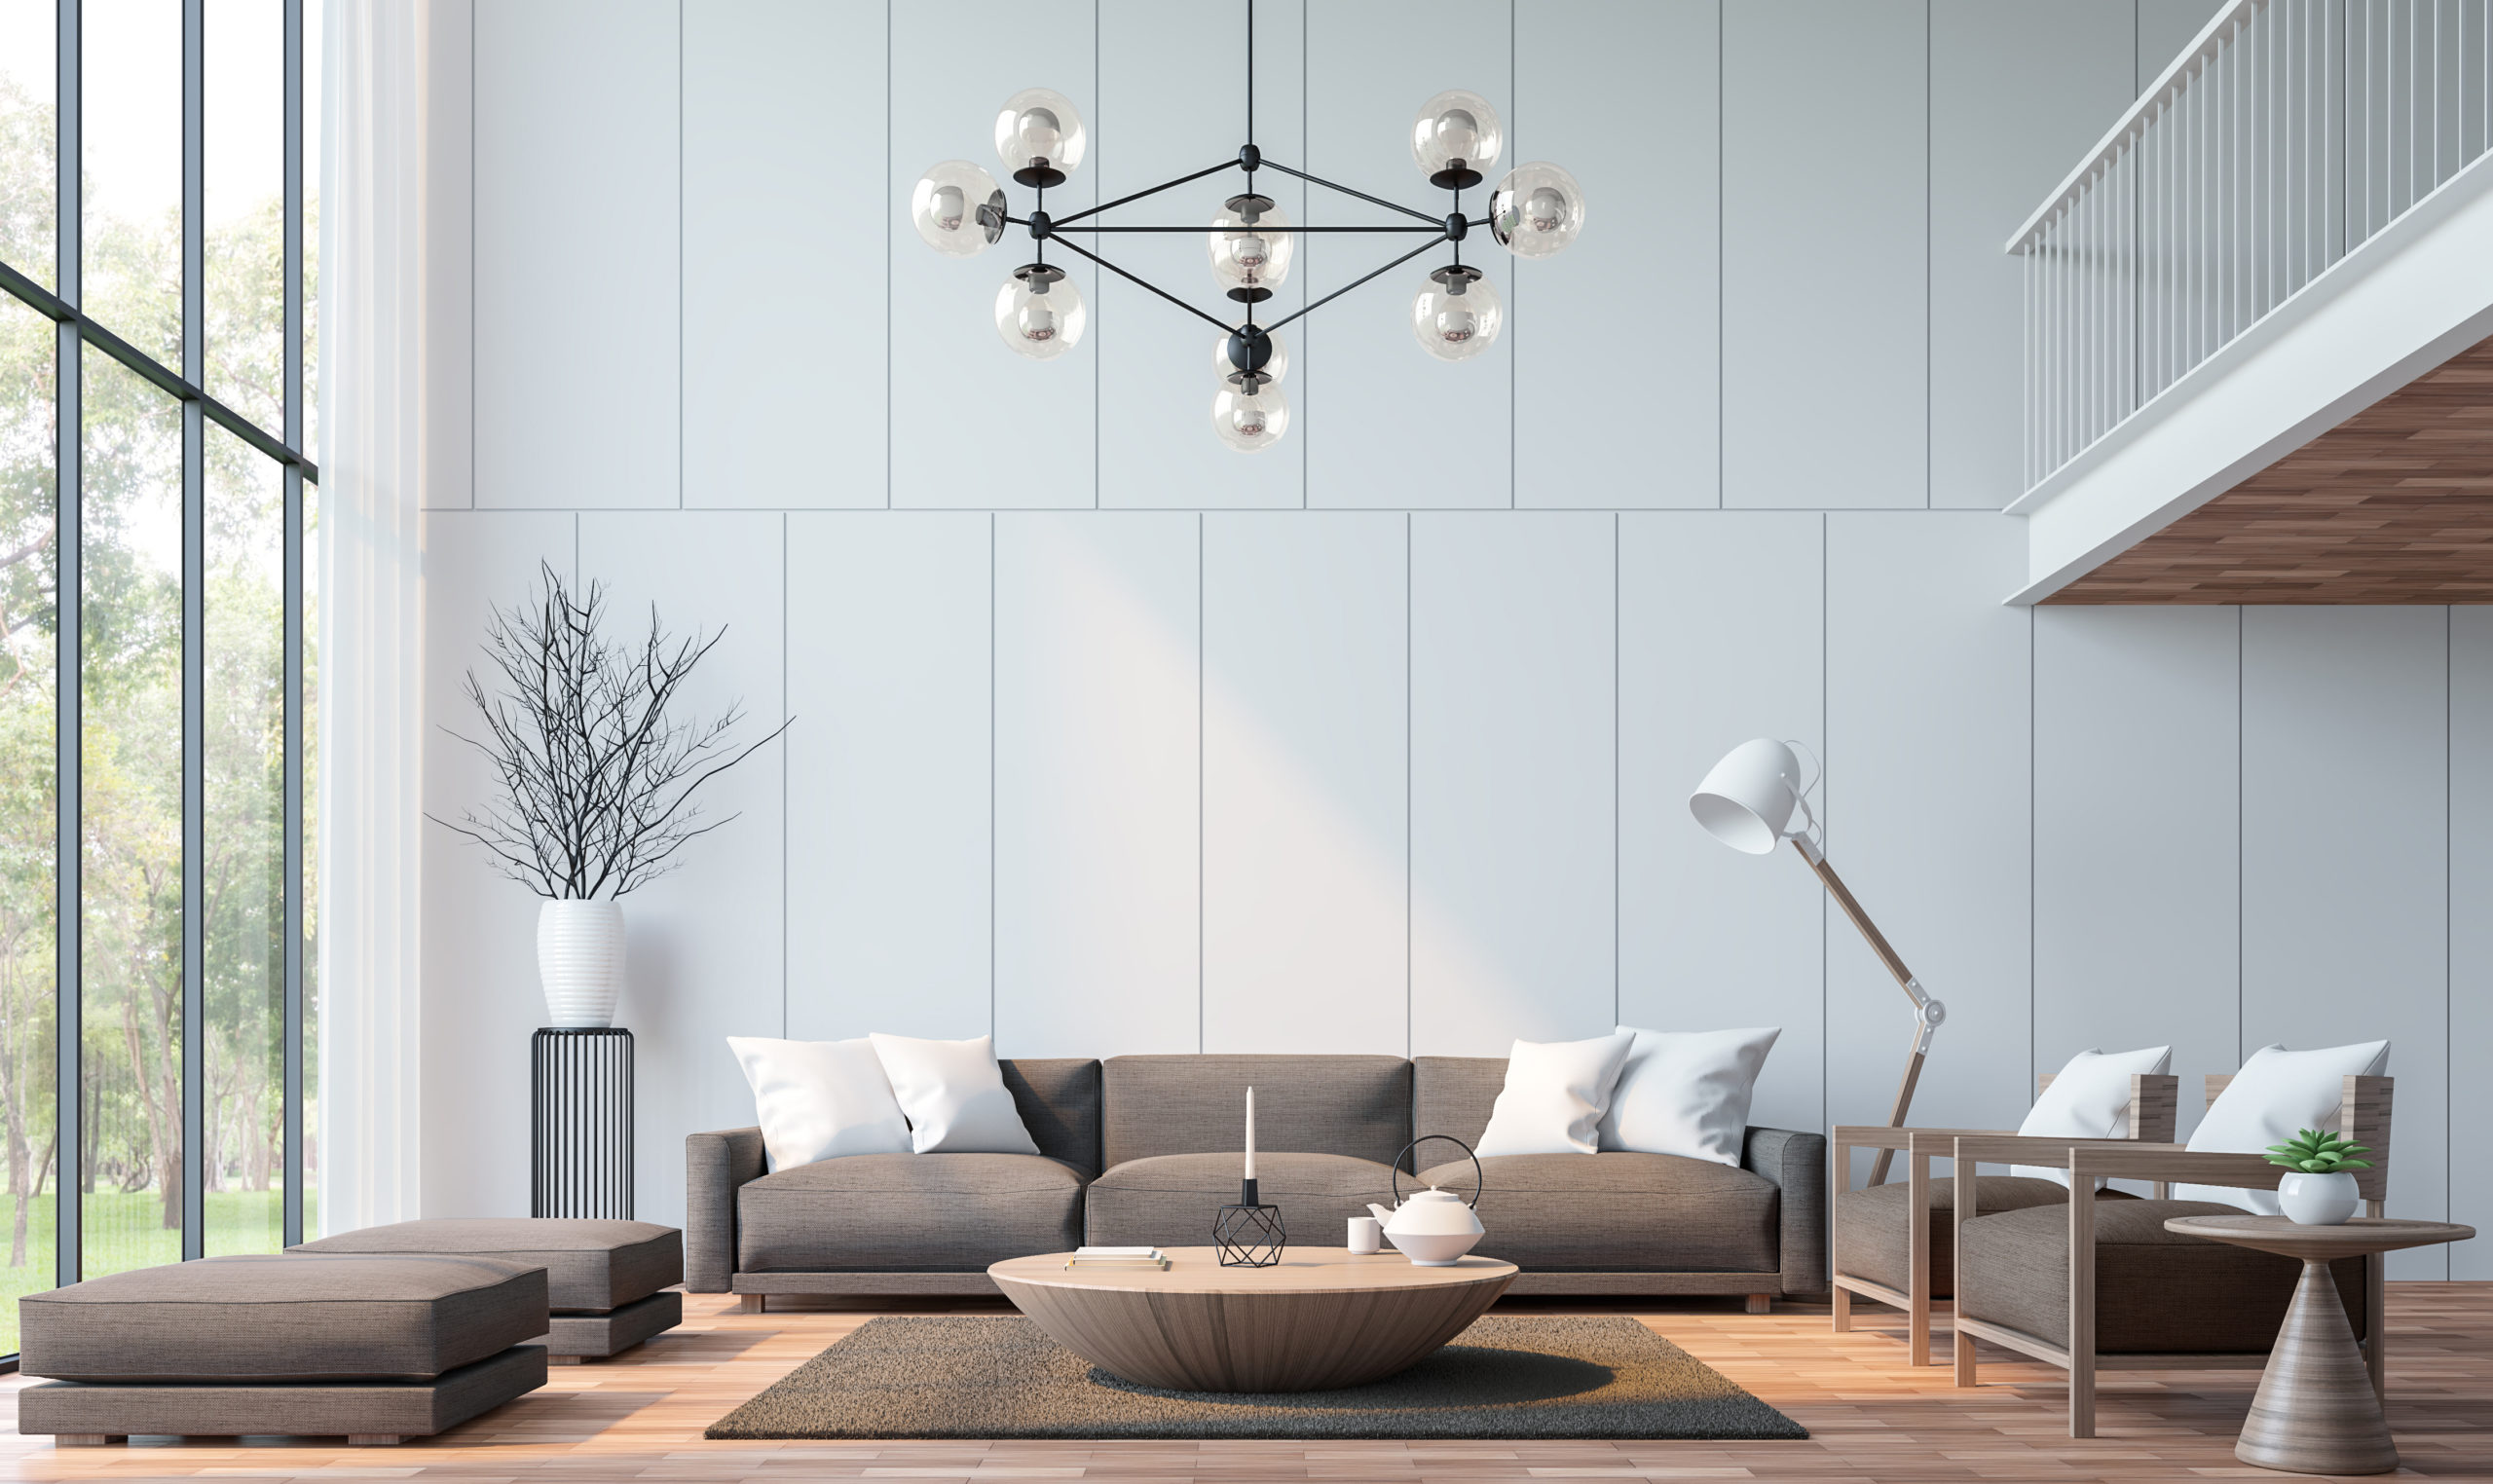 10 Interior Design Trends for 2020 - Welsh Design Studio